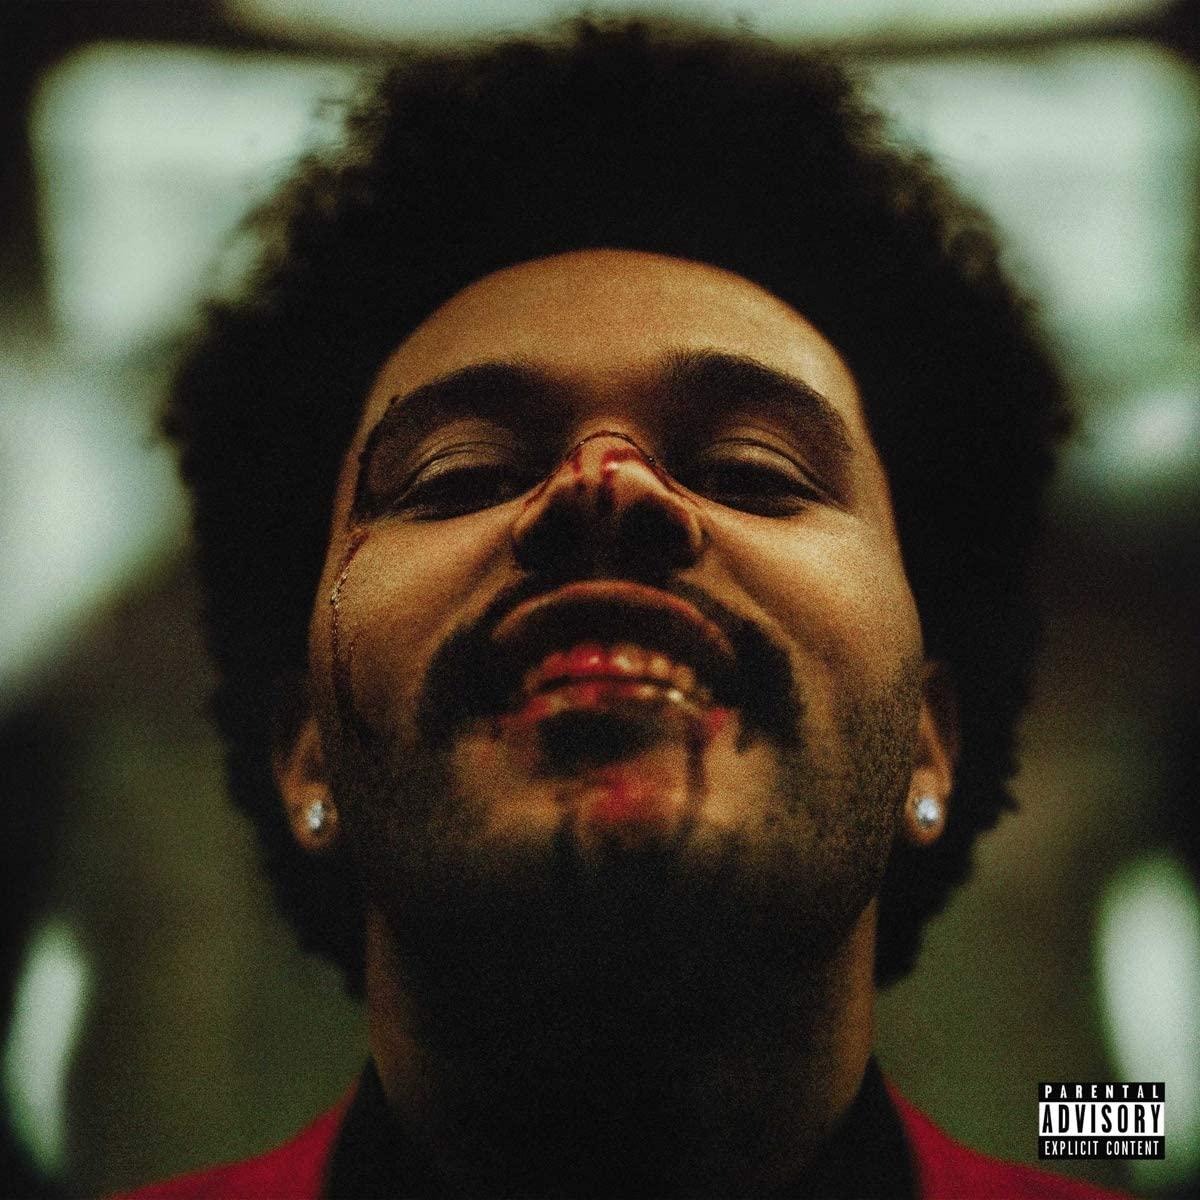 音楽感想「After Hours」The Weeknd